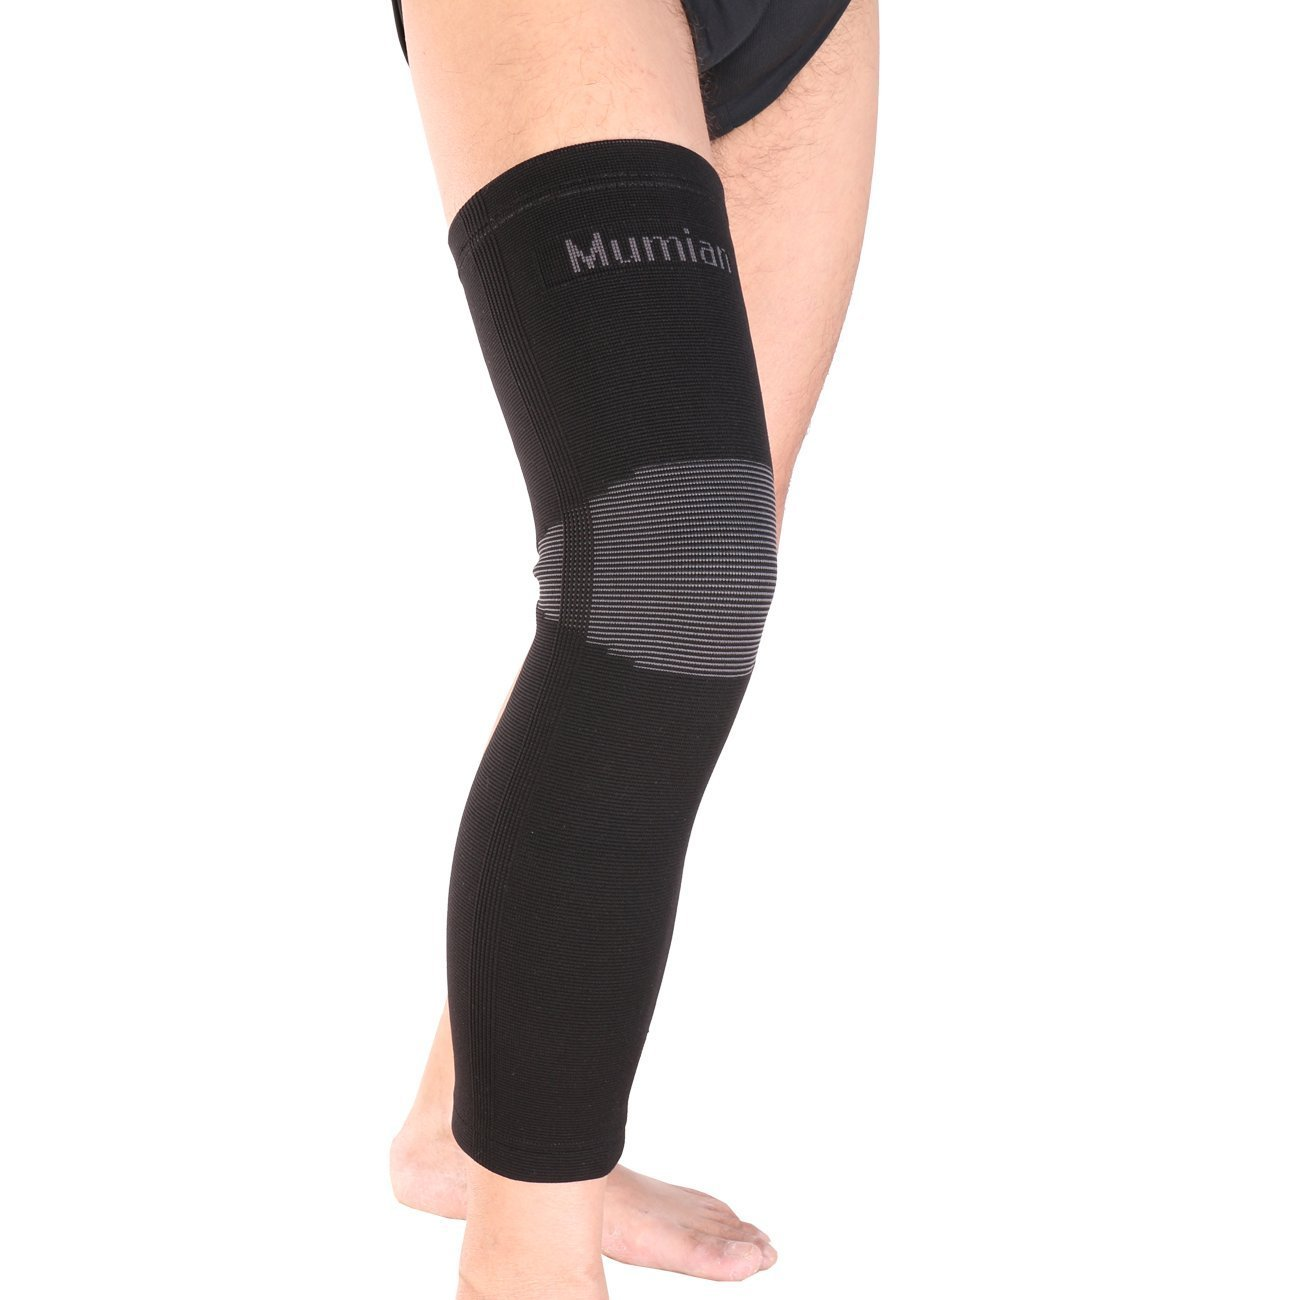 REIZ Elastic Sports Leg Knee Support Brace Wrap Protector Knee Pad Long Knee Sleeve Cap Patella Guard Knee A6 - Black - 1PCS